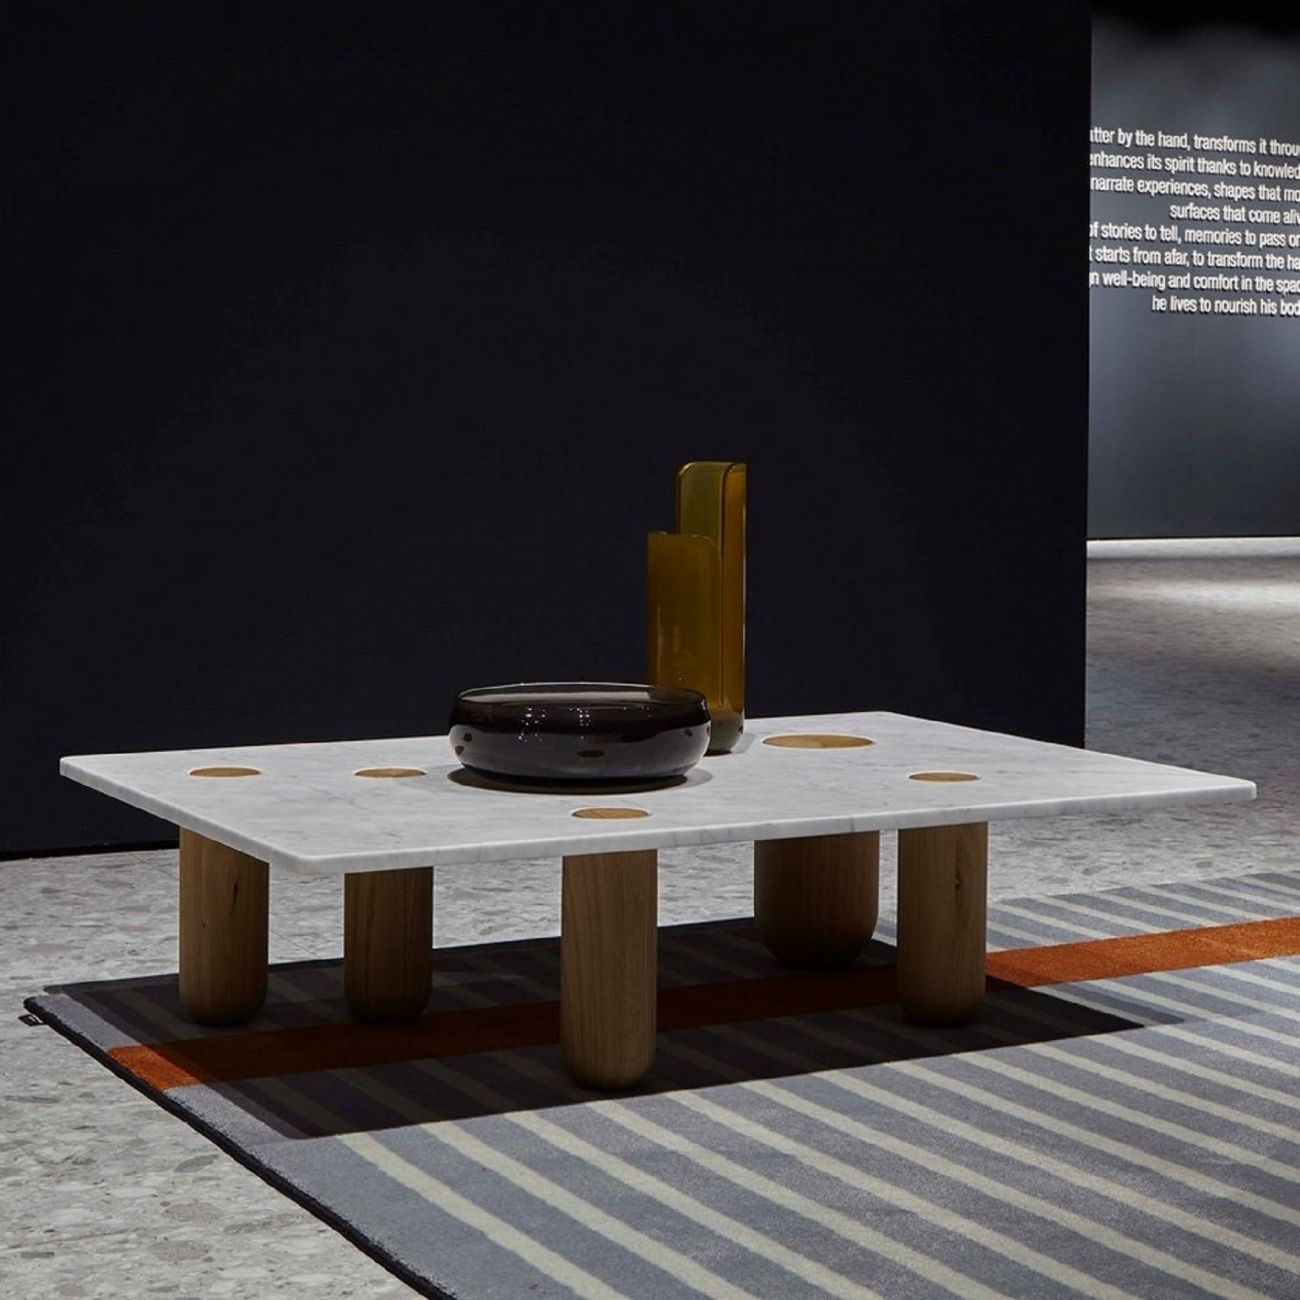 Antonio Lupi Coffee Table Tattahome Stone Coffee Table Coffee Table Coffee Table Design [ 1300 x 1300 Pixel ]